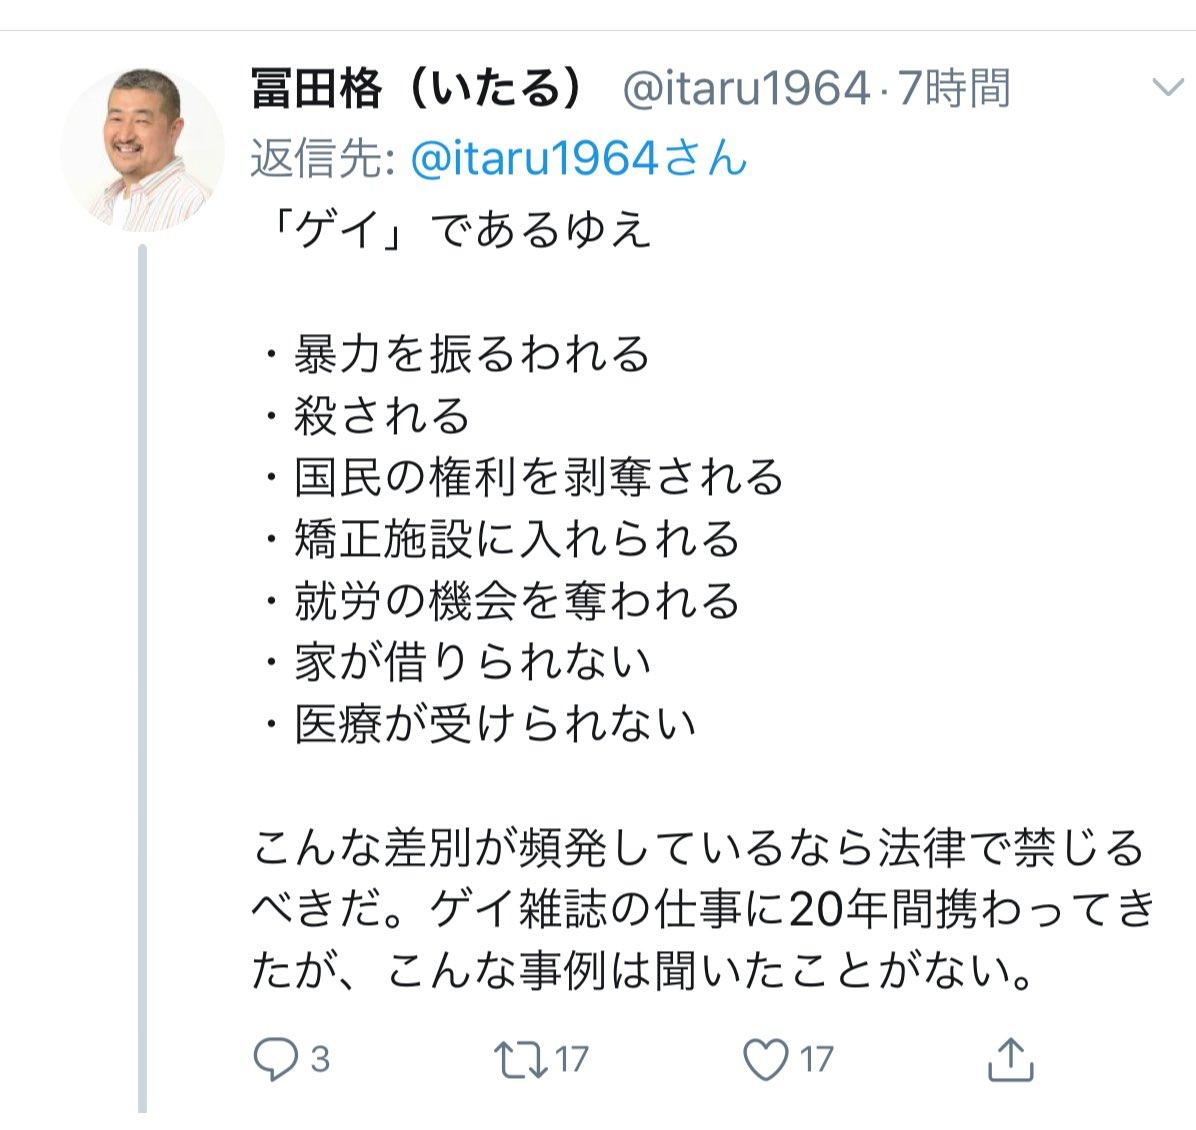 RT @nobuhiko_1973: 20年の間でホモ狩りによって殺された人いましたよね。 希少な出来事だから黙ってろと? https://t.co/3HBv0z2fnx